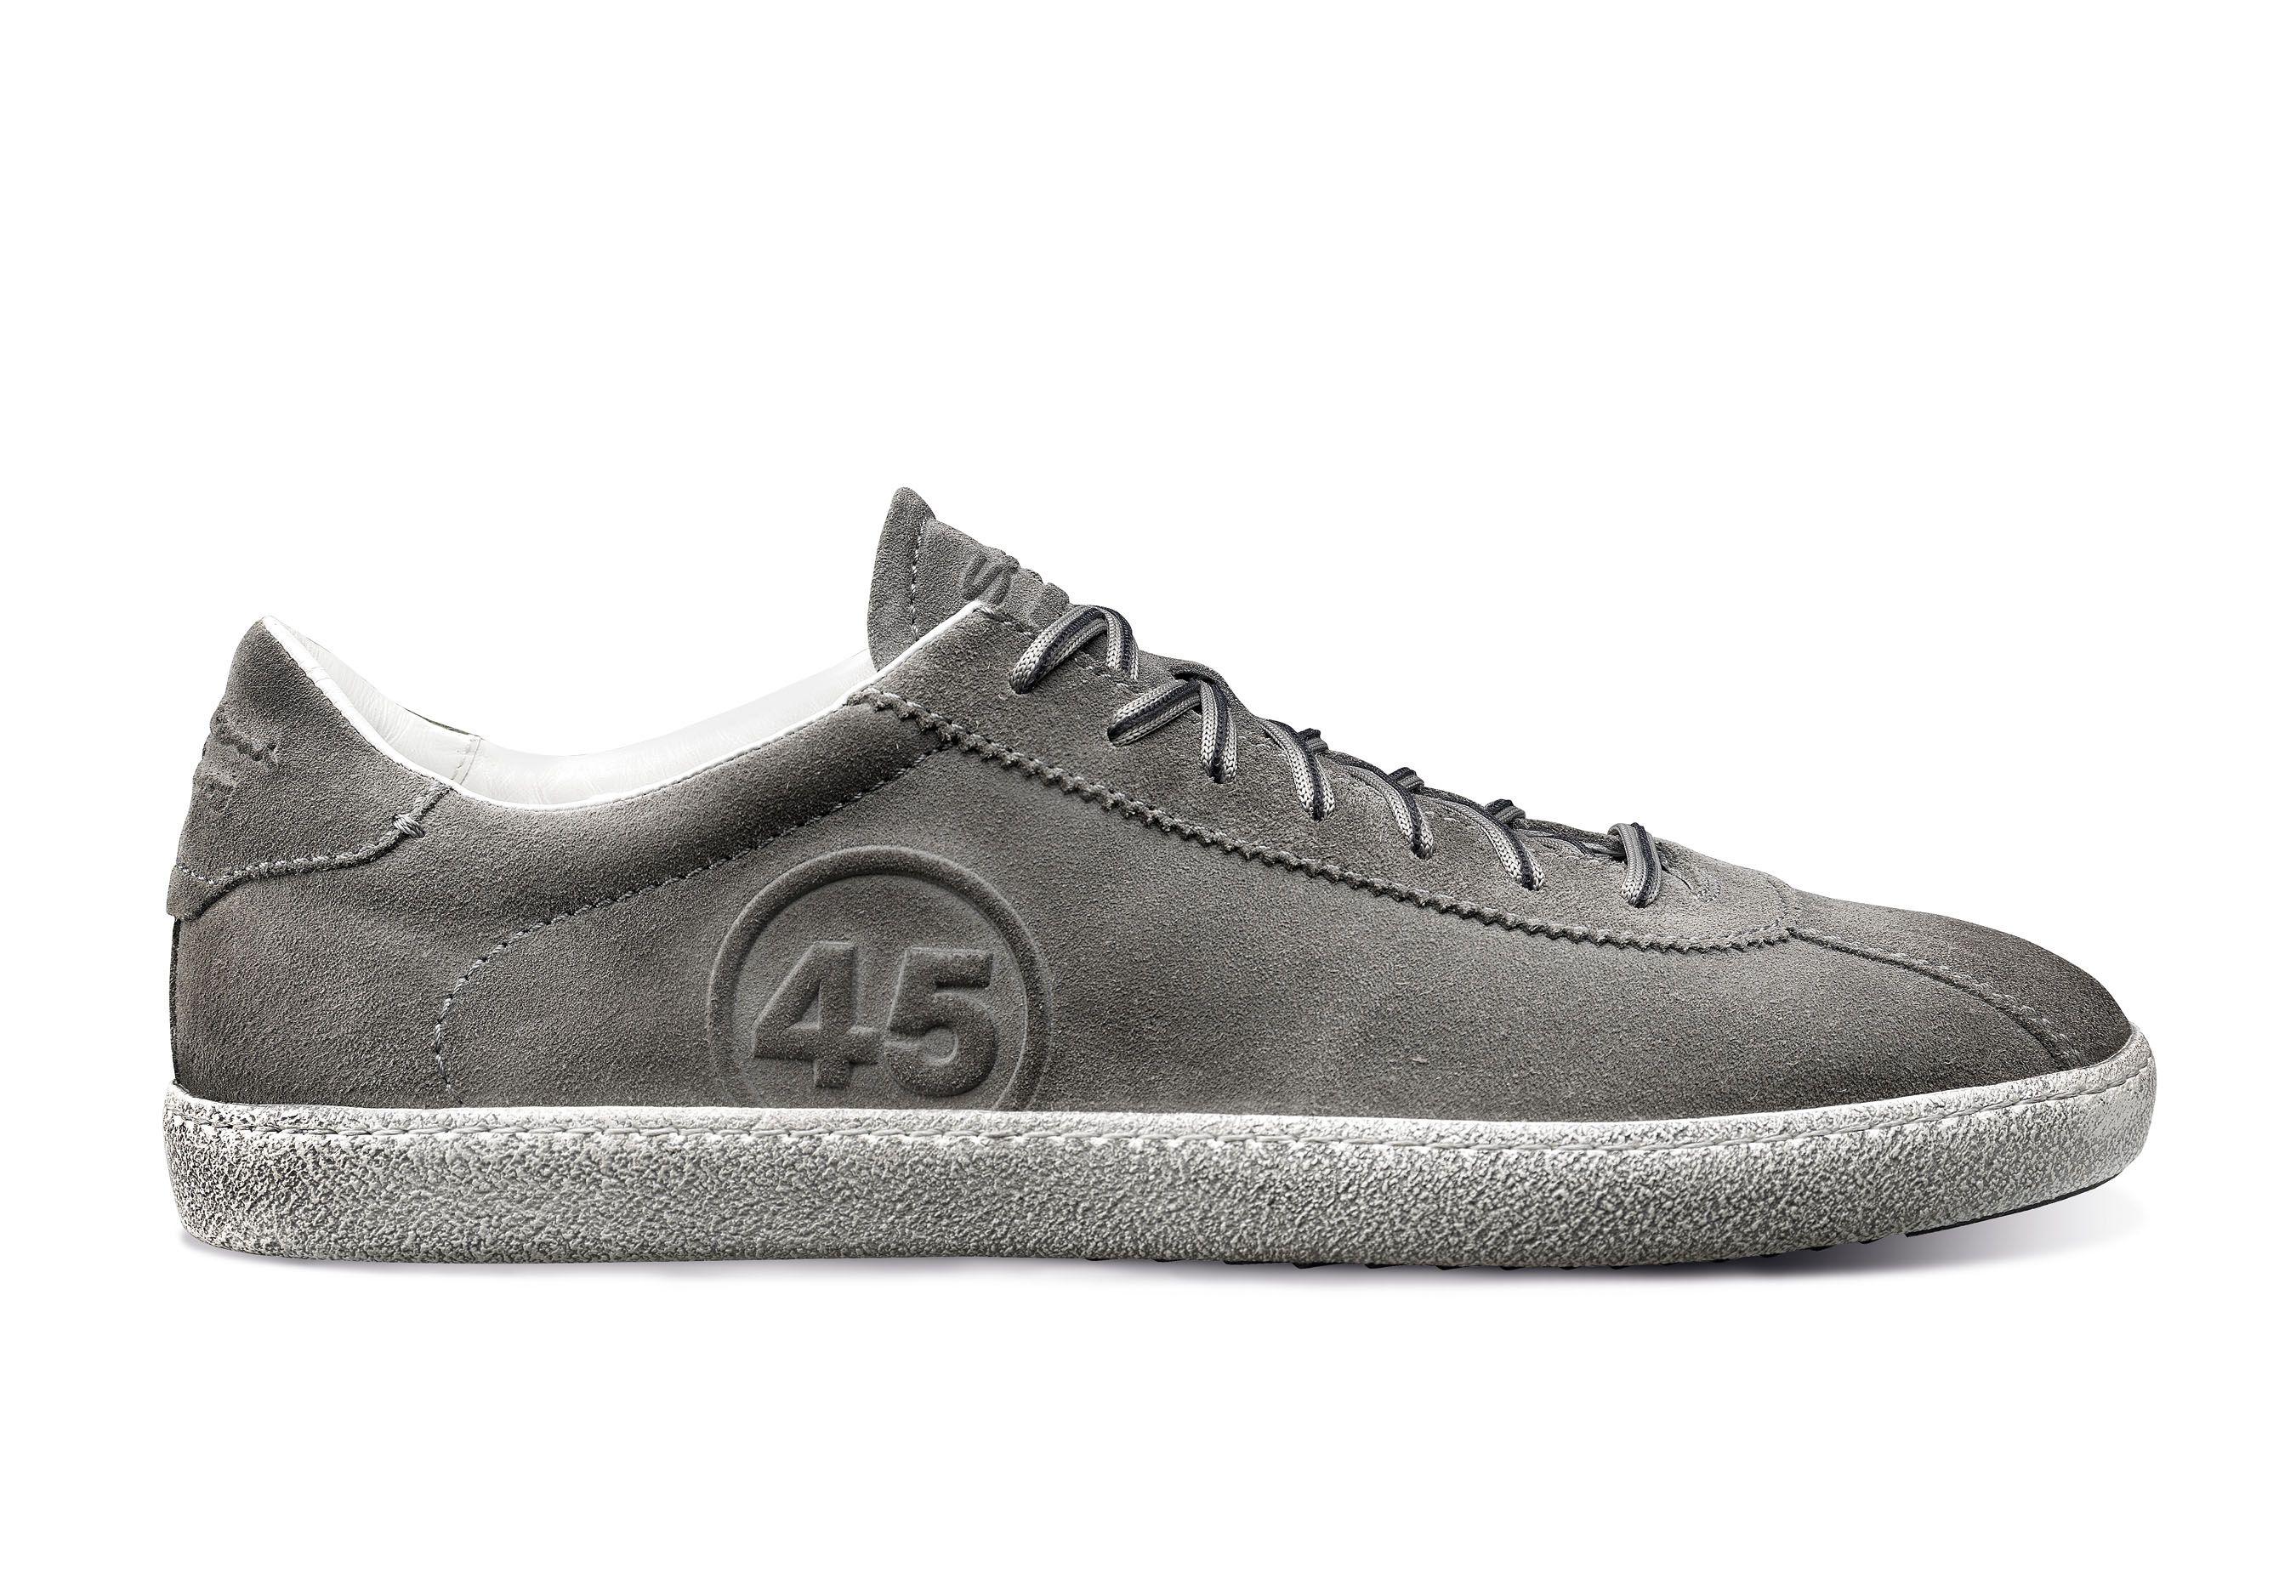 Santoni for AMG collection - A45 #sneaker http://santonishoes.com/ · Best  ShoesLuxury ShoesMercedes AmgOnline BoutiquesMen's ShoesSneakerSlippersPremier  ...